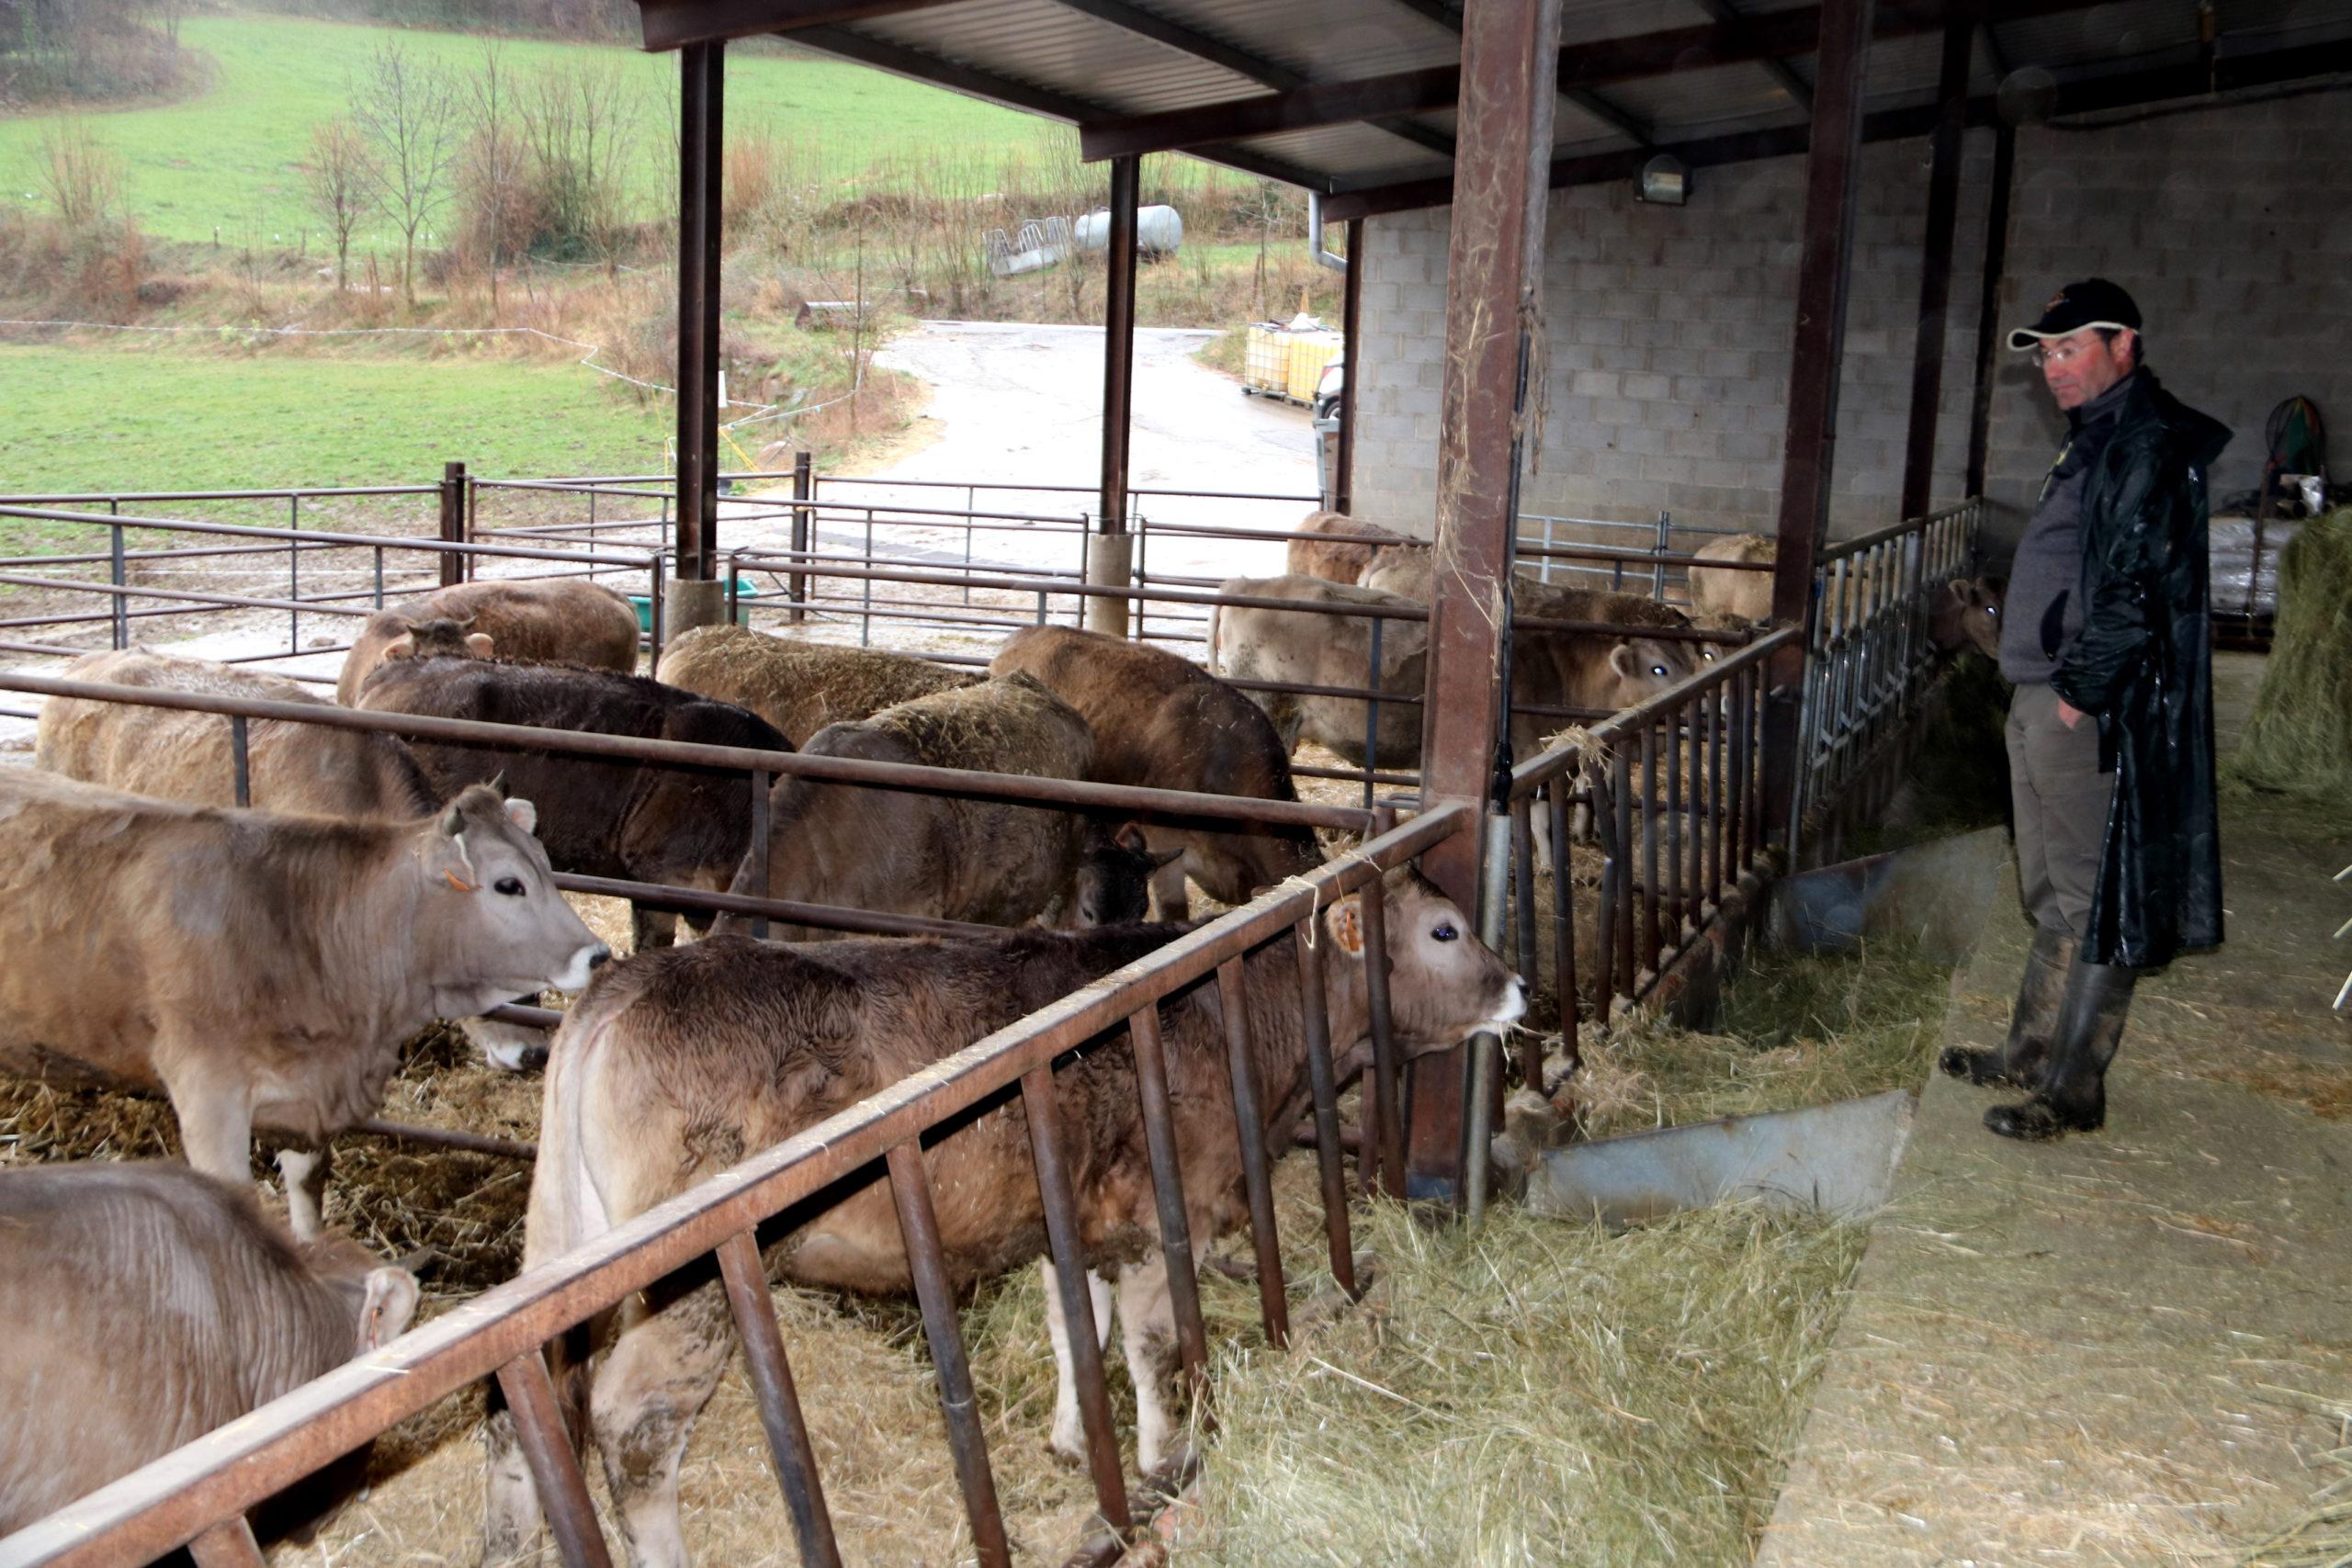 Un ramader en una granja de vaques | ACN